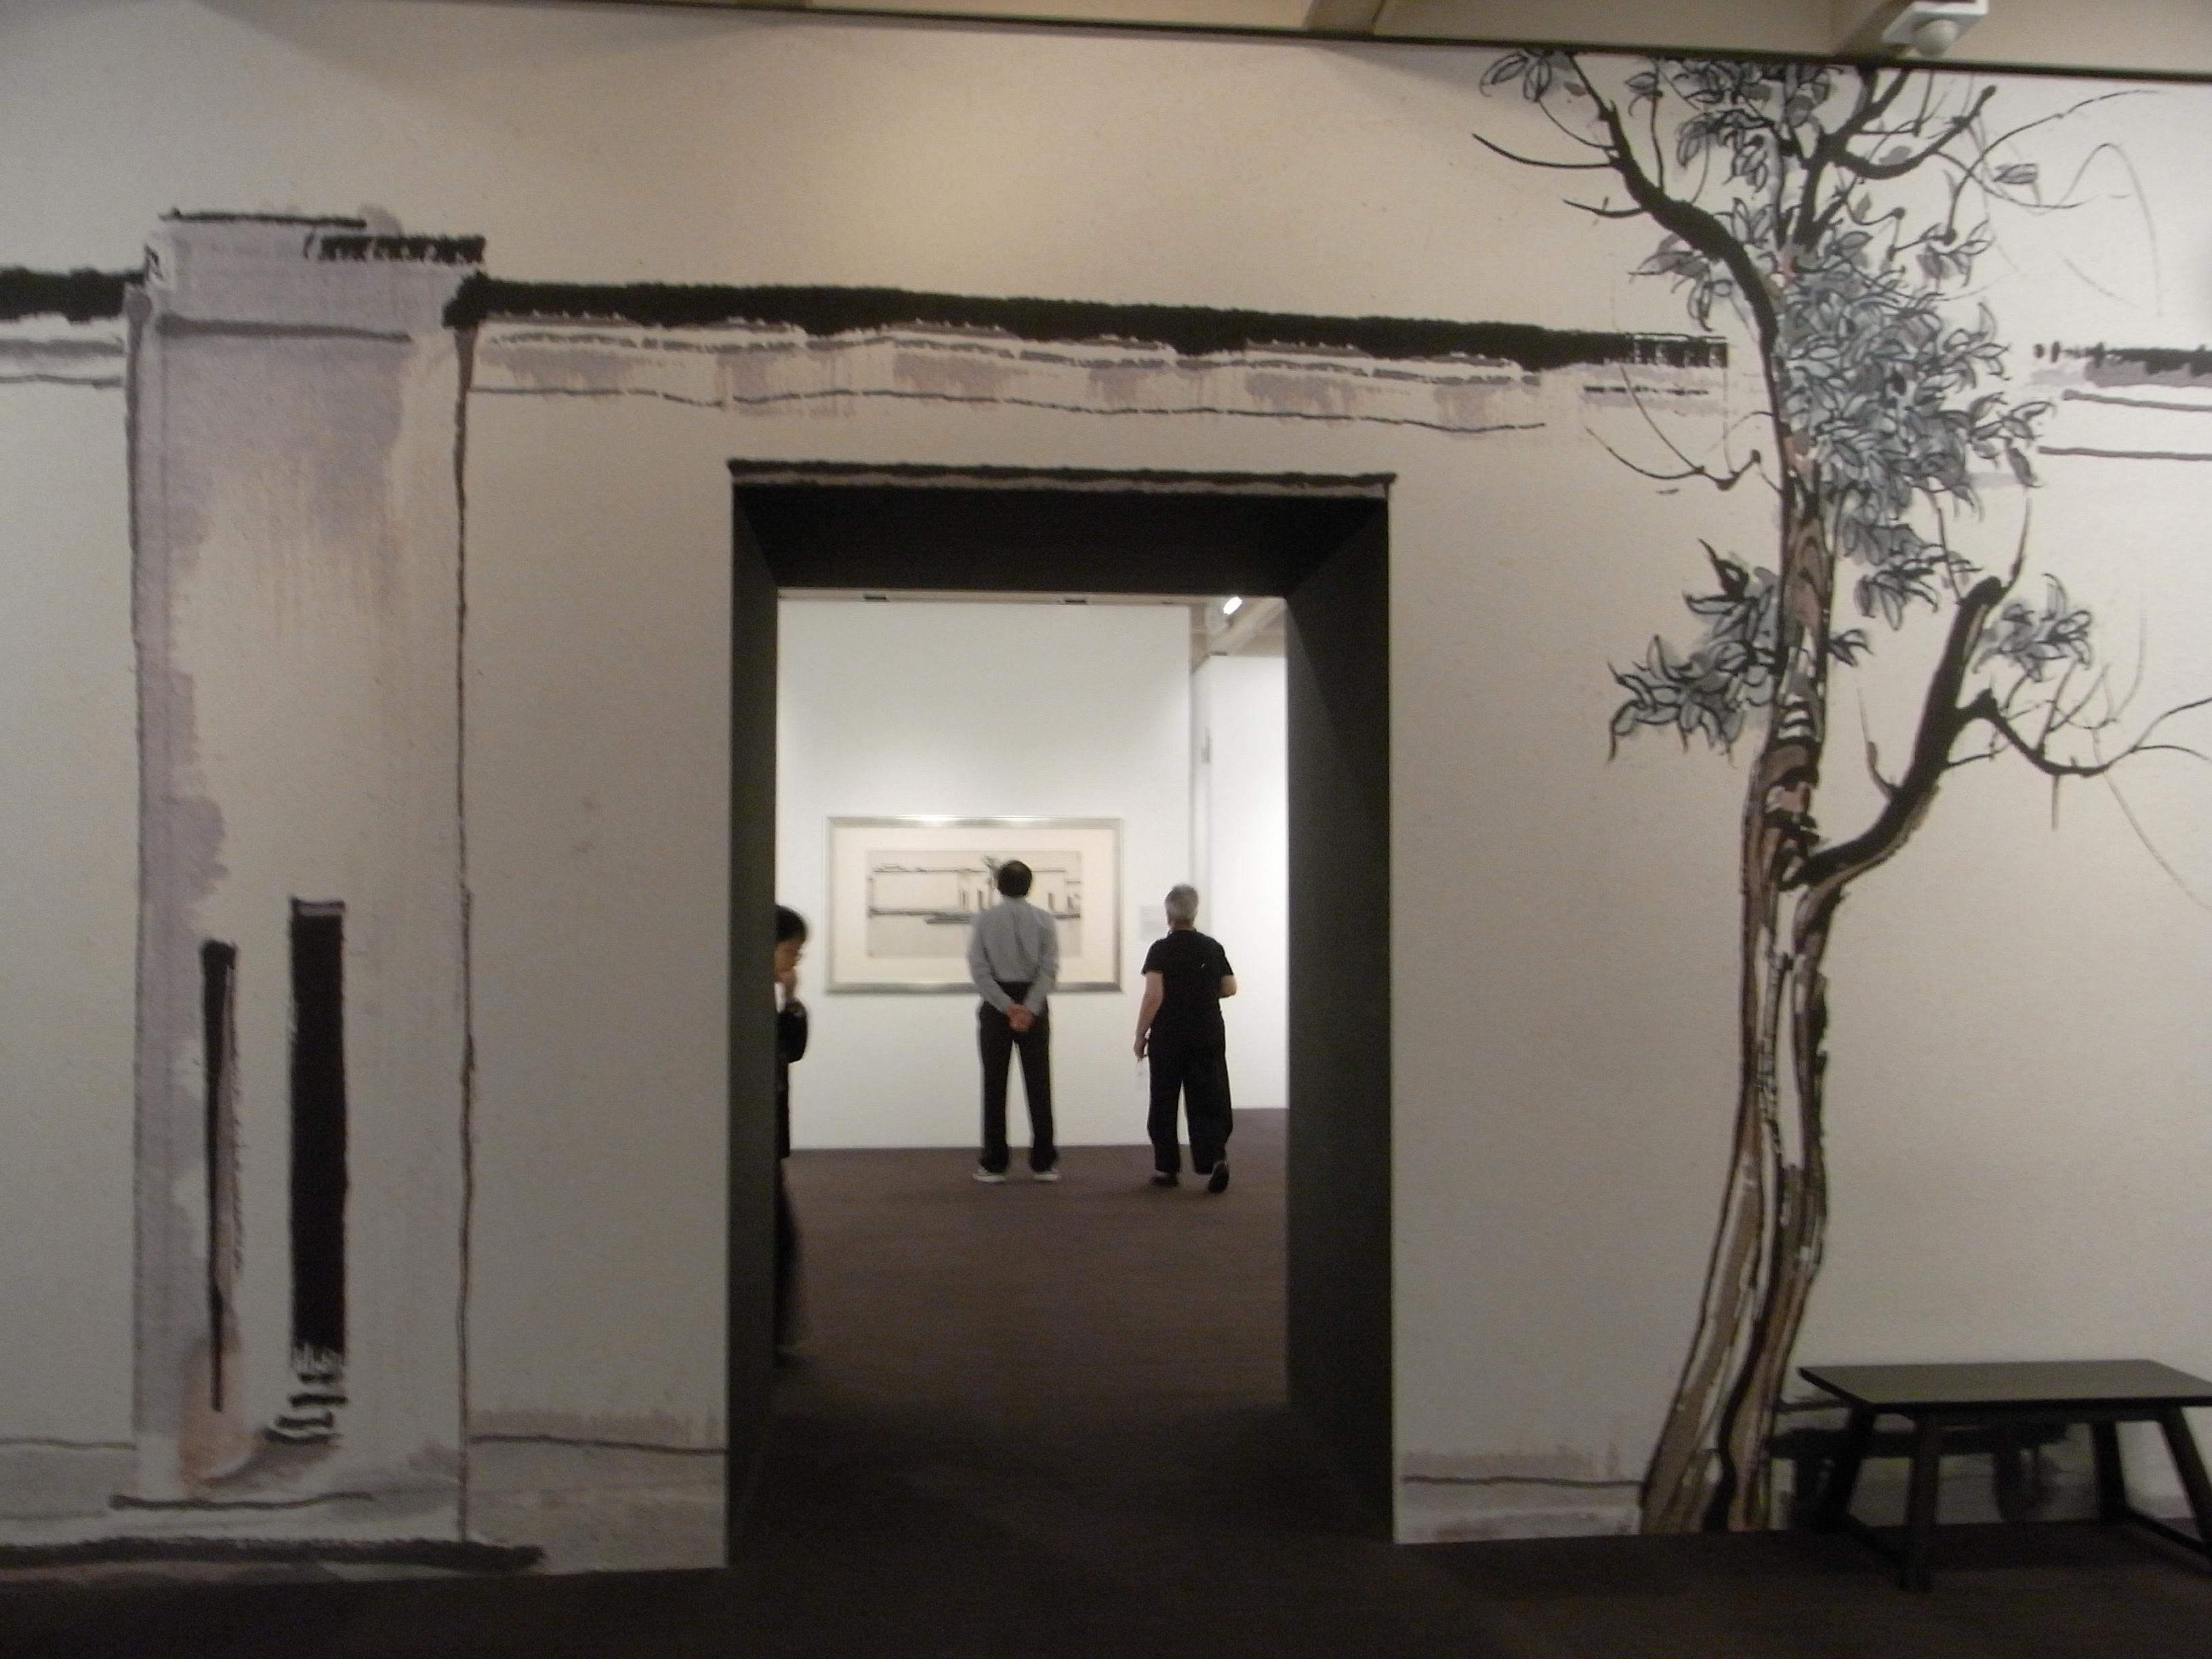 Fabulous Museum Wall Art 3264 x 2448 · 1645 kB · jpeg